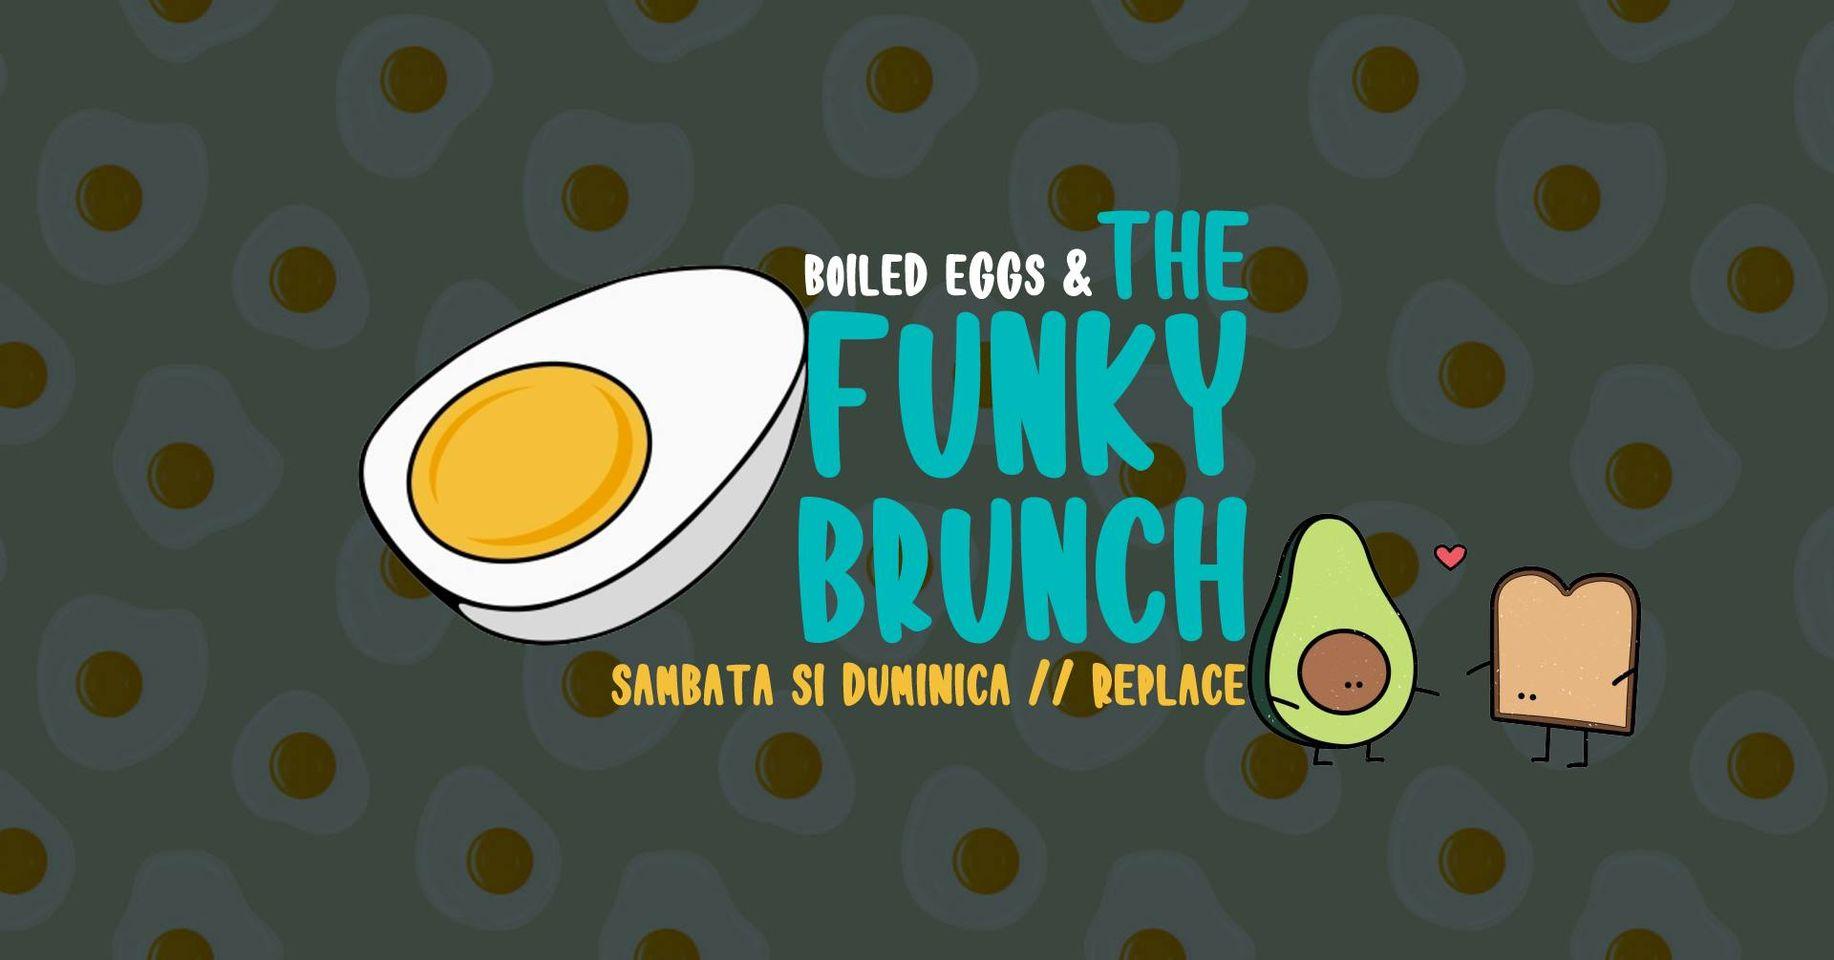 evenimente weekend 16-18 oct Funky brunch la RePlace